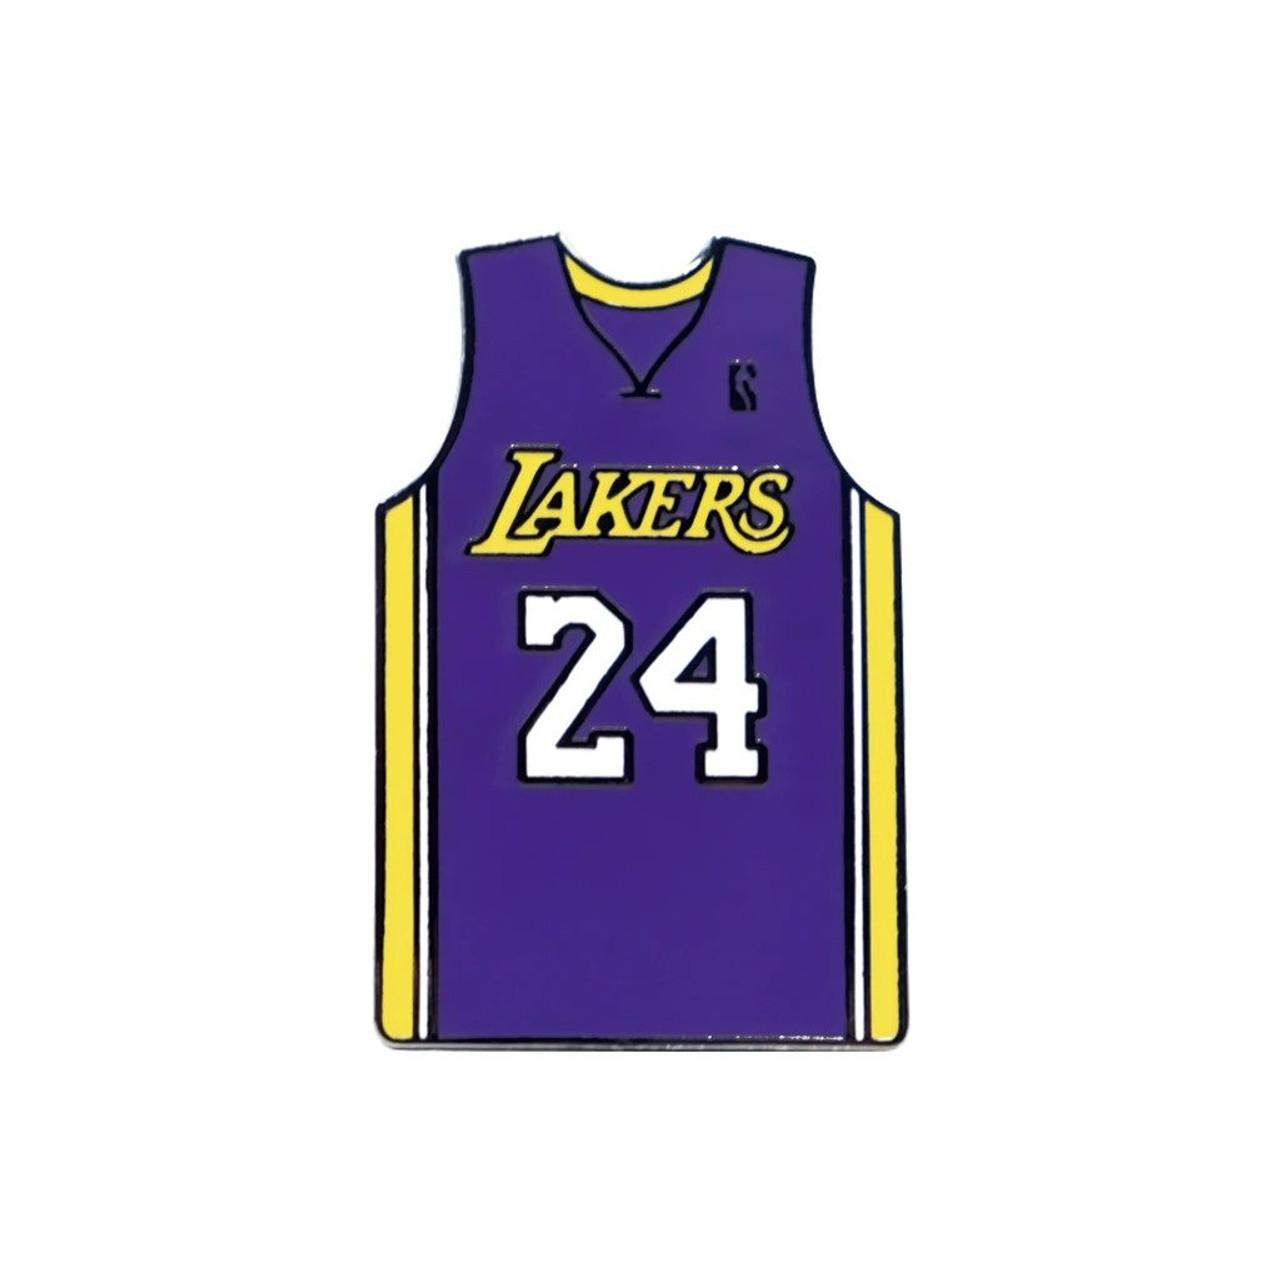 Kobe Bryant 24 Lakers Purple Jersey by KingPinz